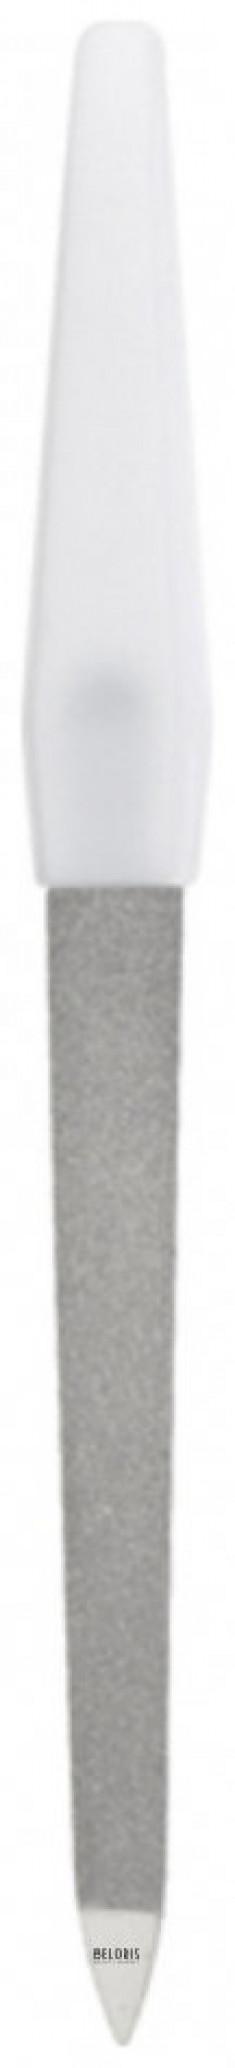 Пилочки Kaizer